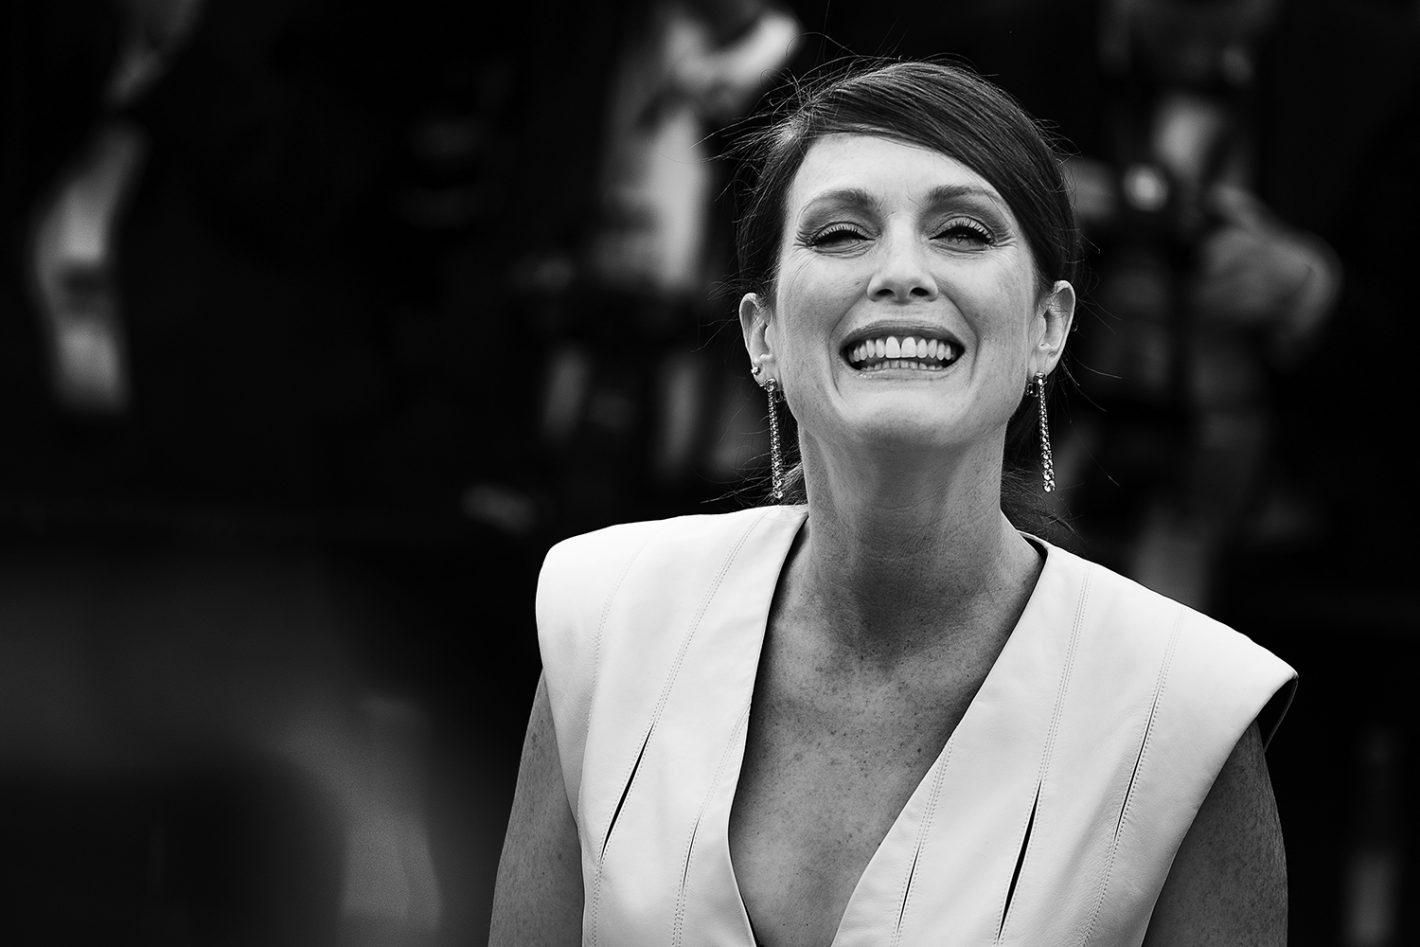 Festival de Cannes 2016 - Julian Moore - Nikon D5